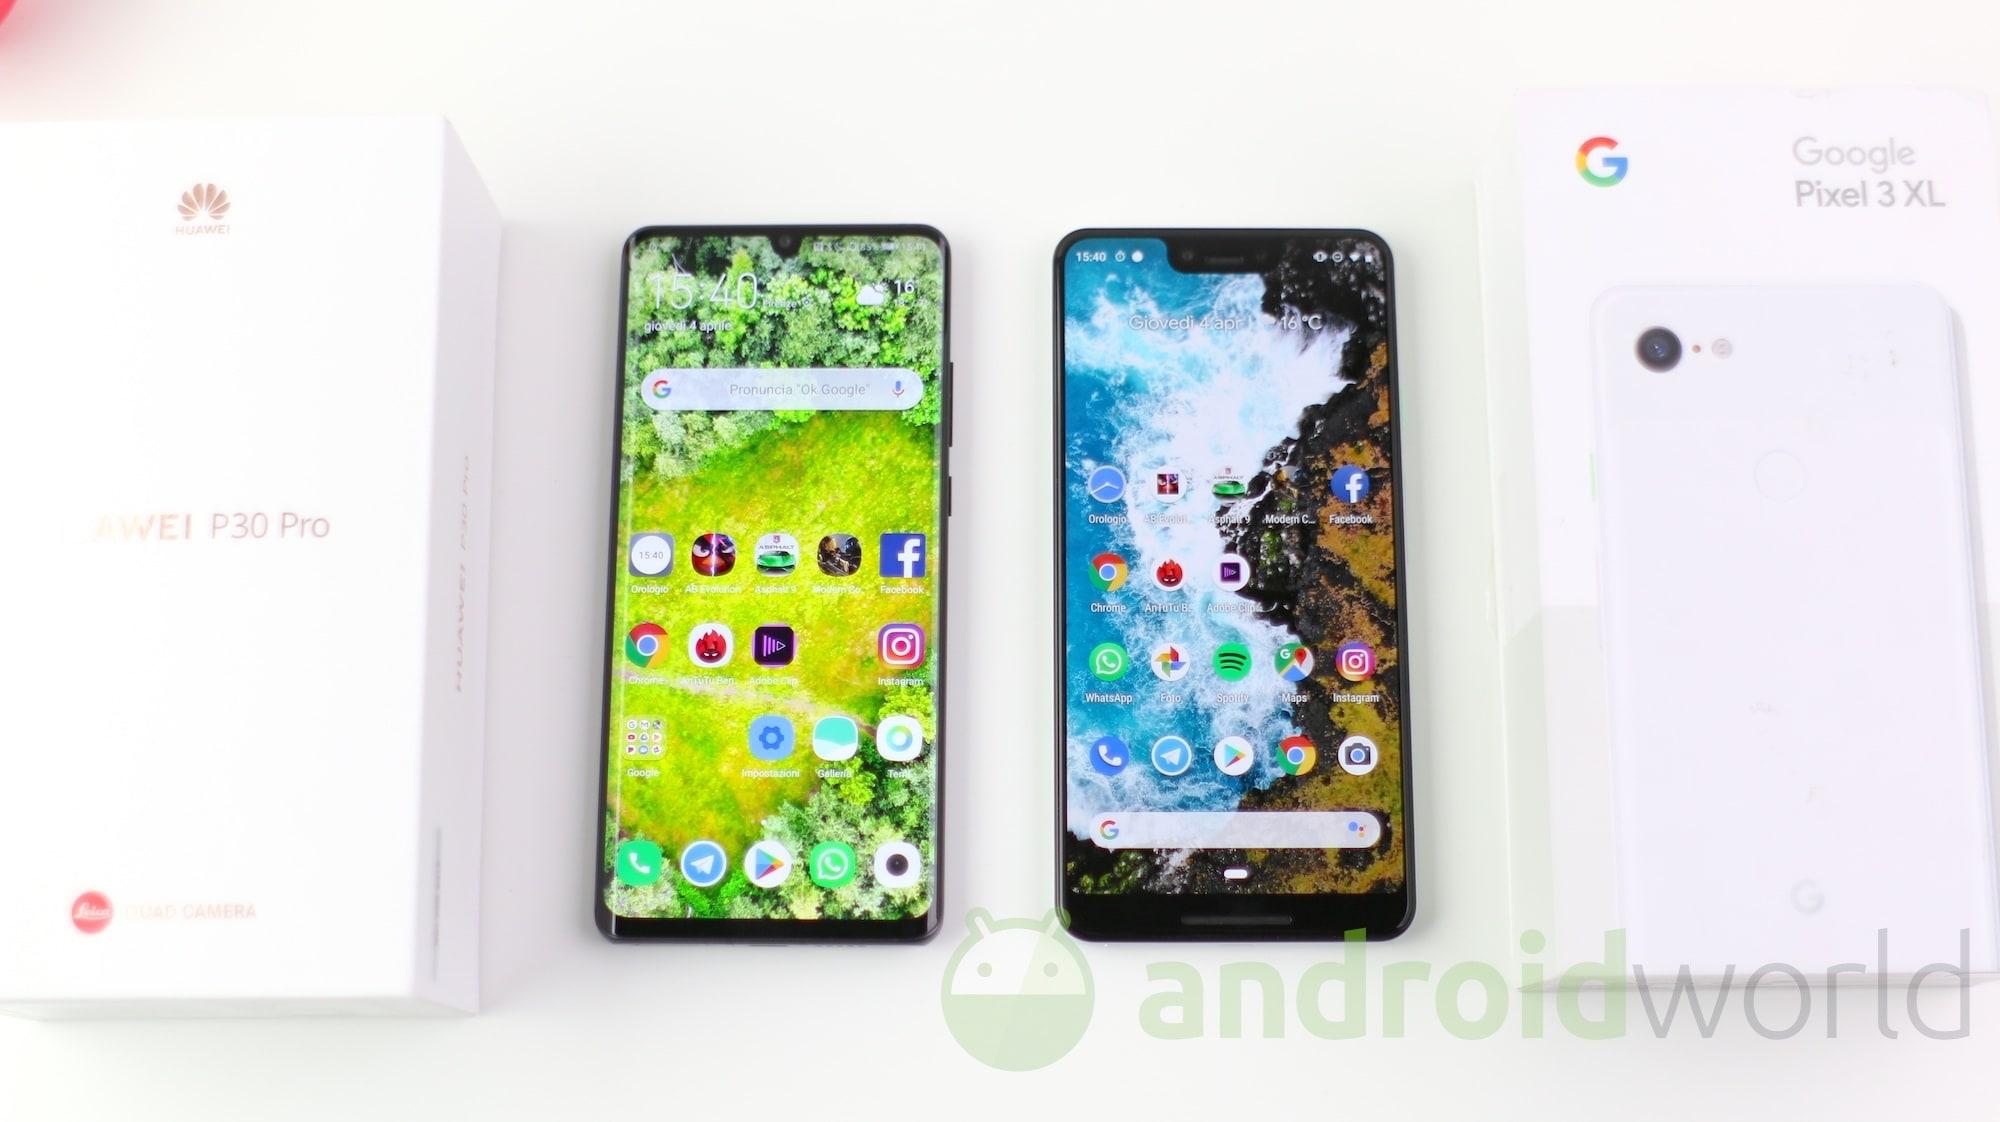 Google Pixel 3 XL – Huawei P30 Pro – 1